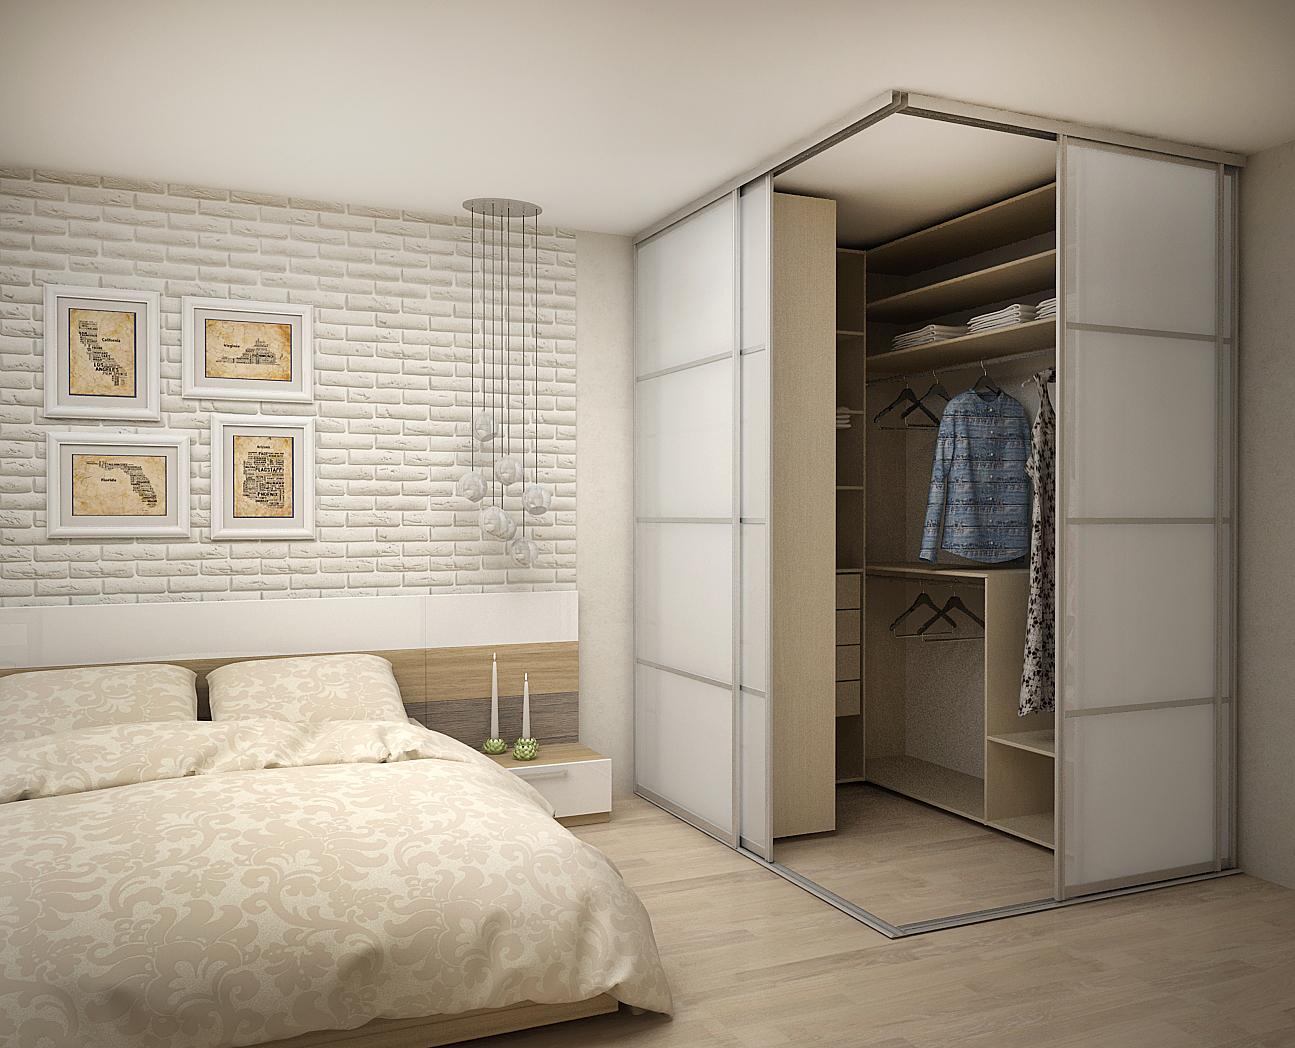 garderobnaya v spalne - Гардеробная в квартире